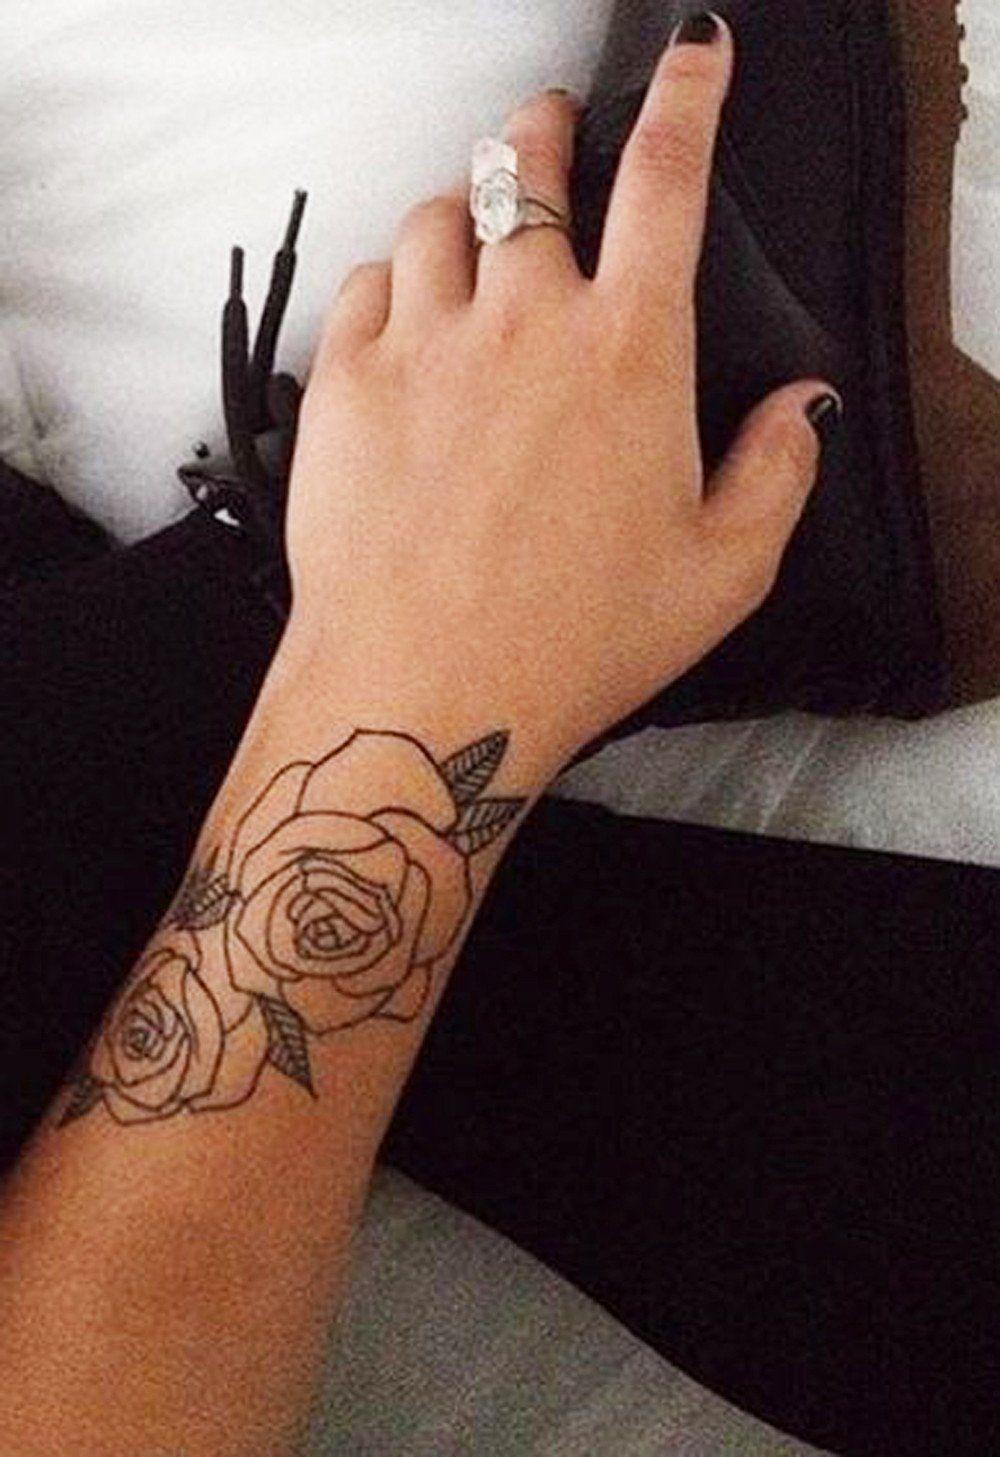 Black Rose Forearm Tattoo Ideas For Women Mybodiart Com In 2020 Forearm Tattoo Women Rose Tattoos For Women Arm Tattoos For Women